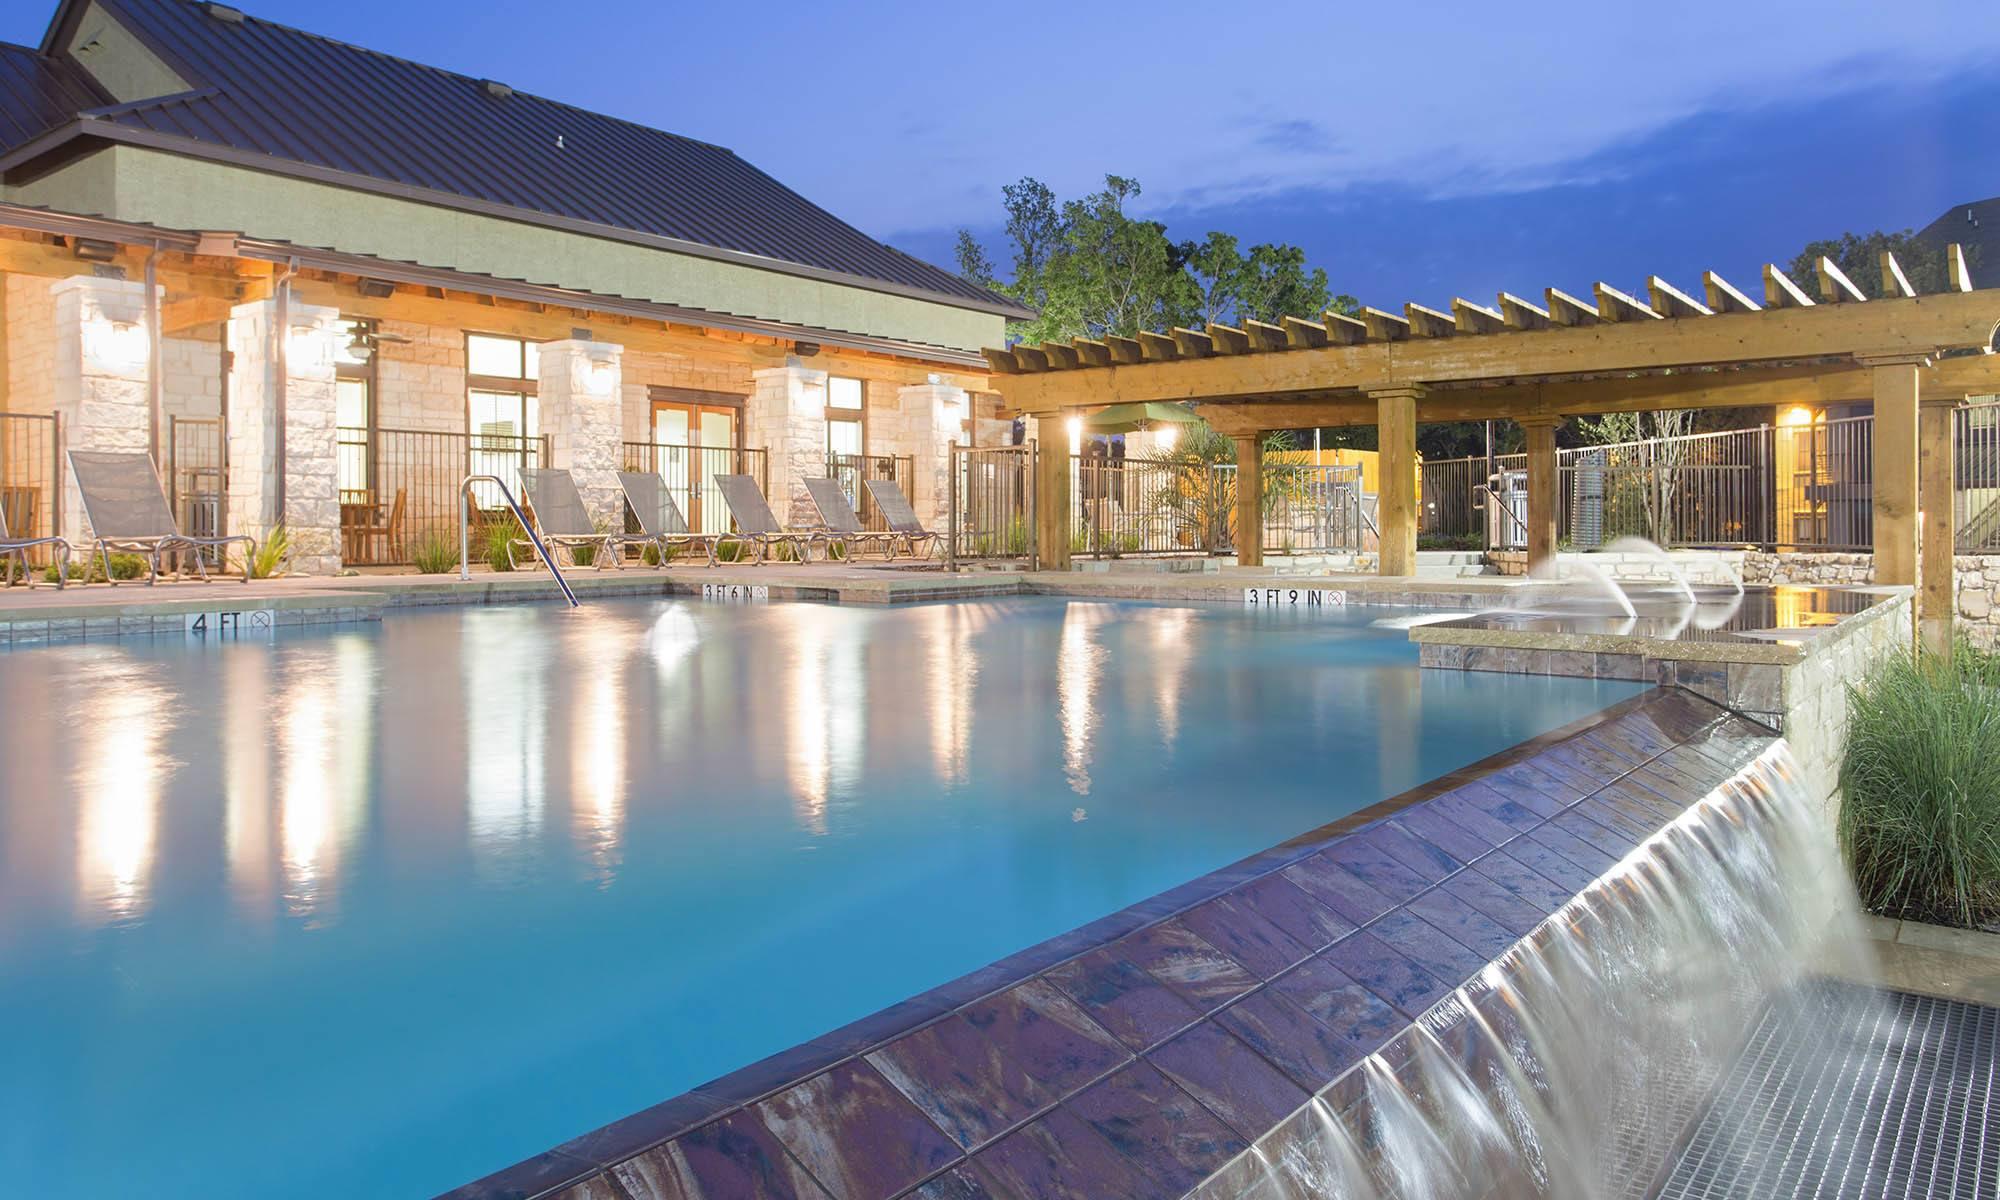 South Austin Tx Apartments For Rent Ethos Apartments